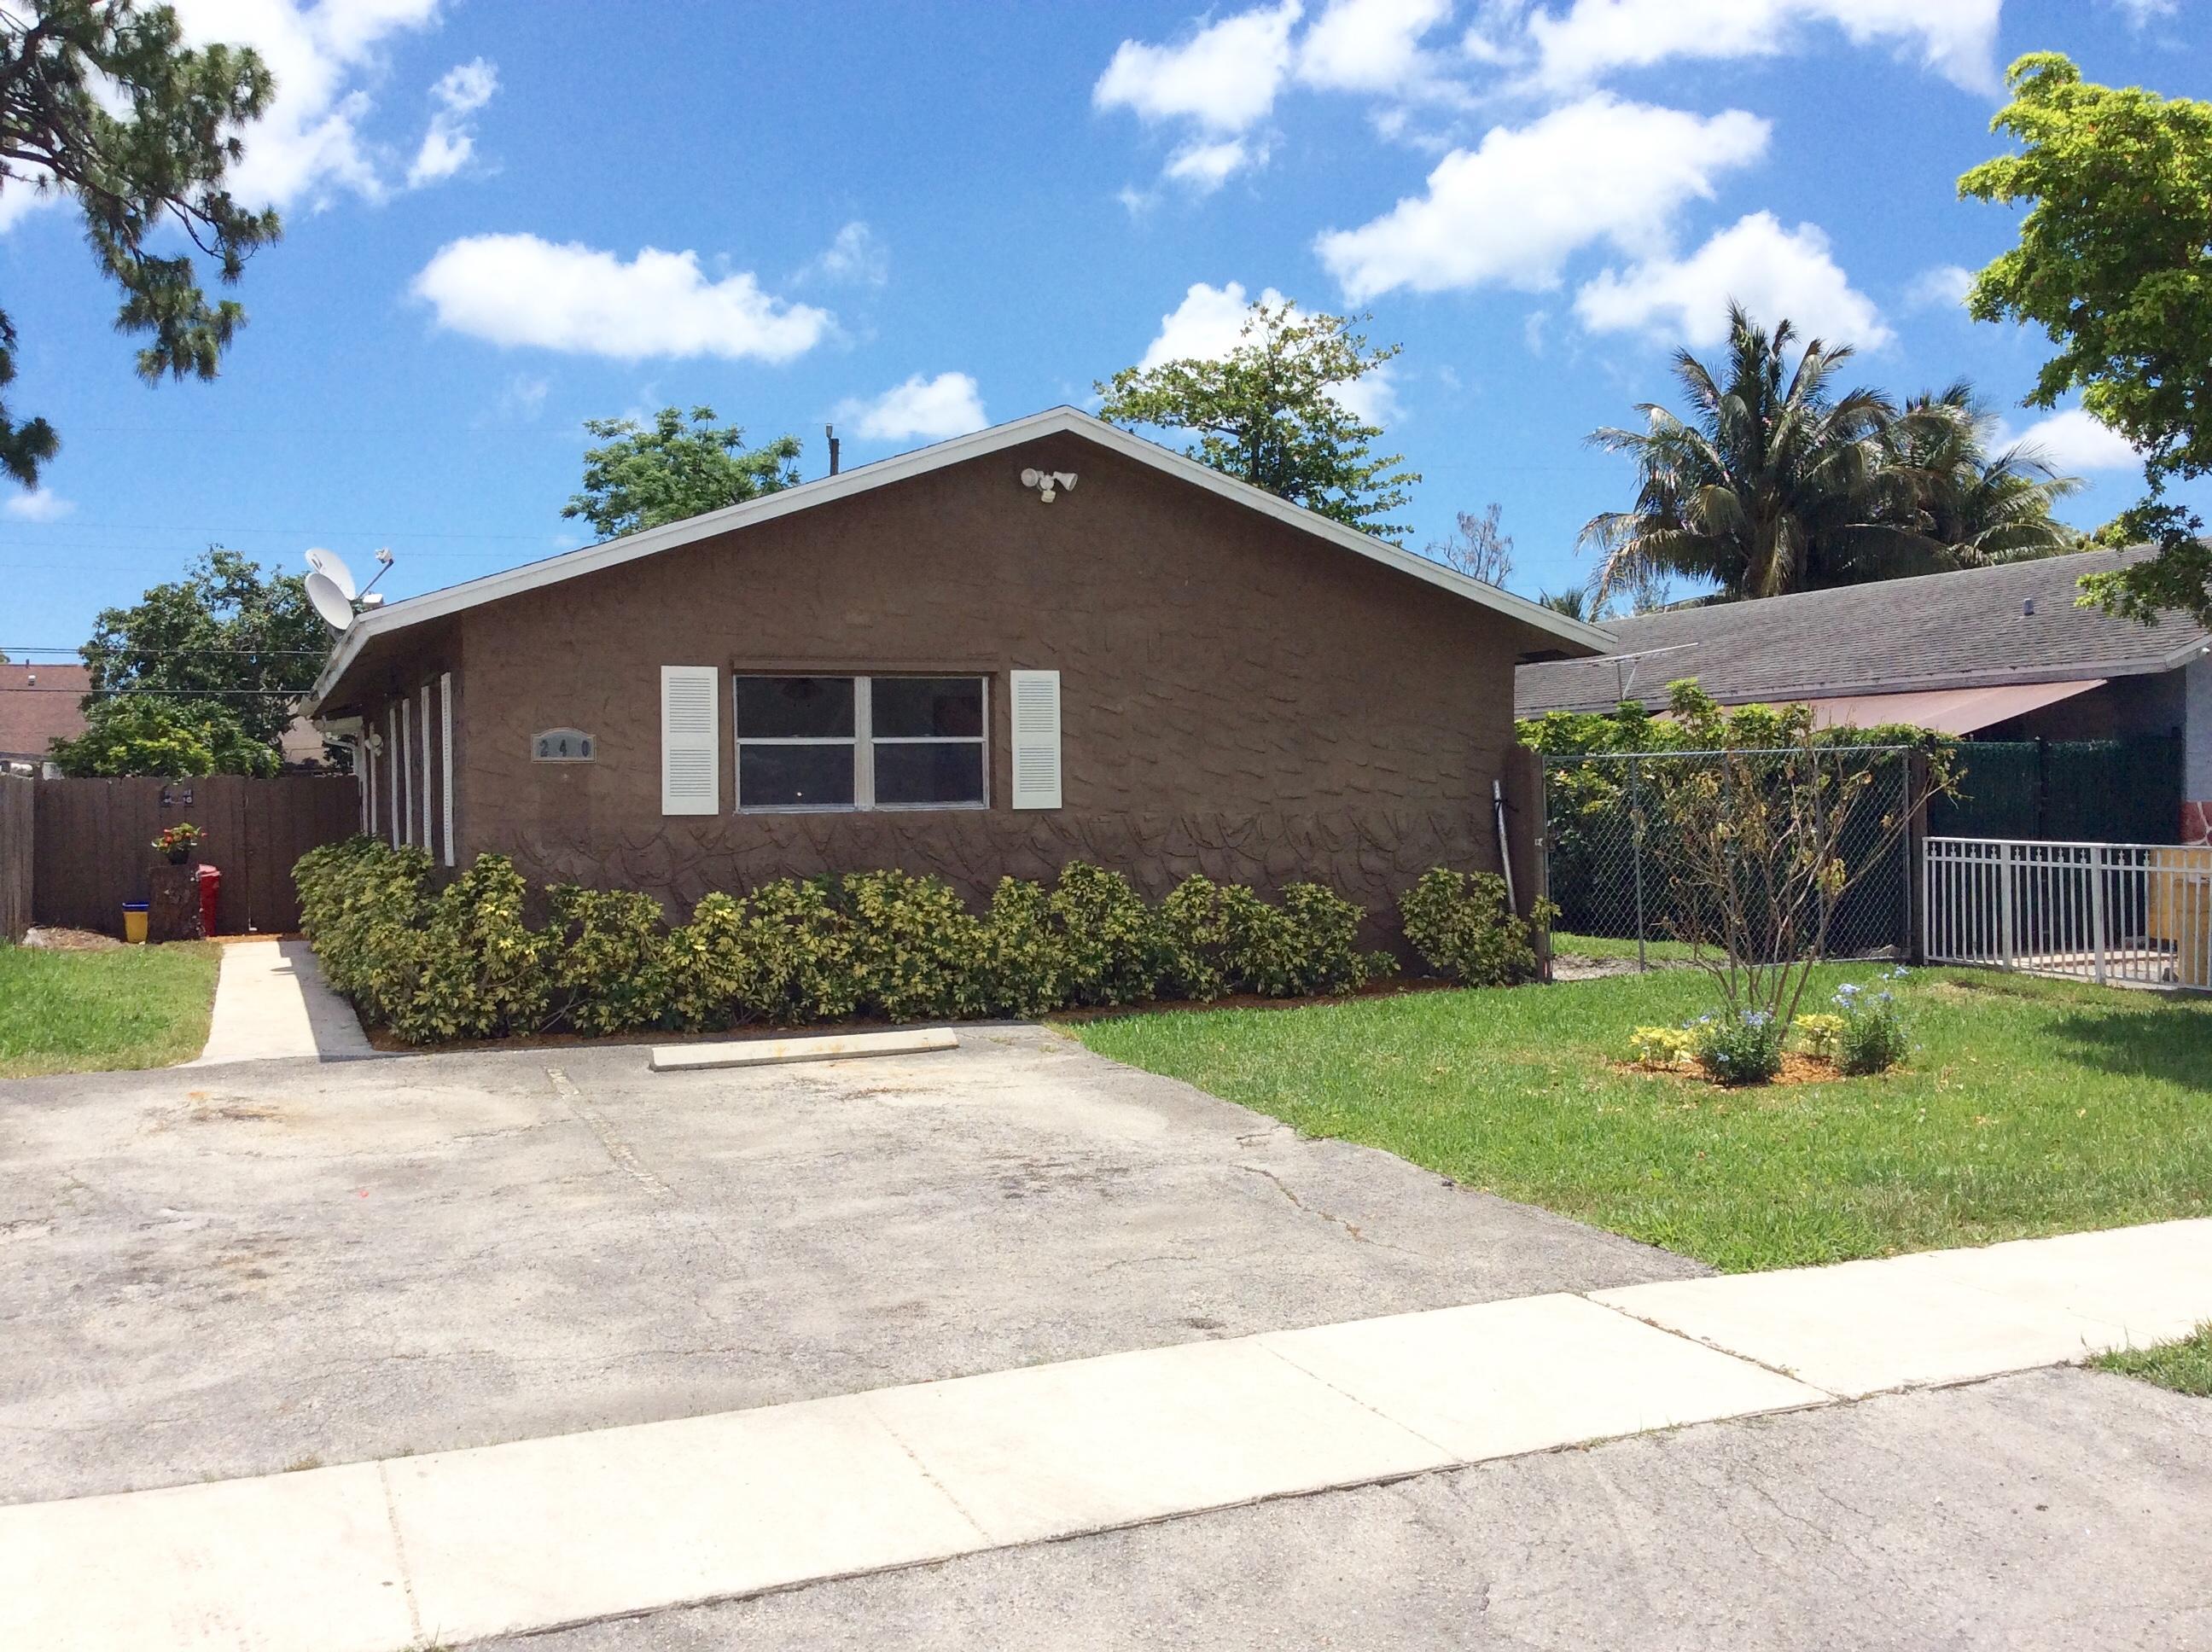 240 Fleming Avenue - Greenacres, Florida